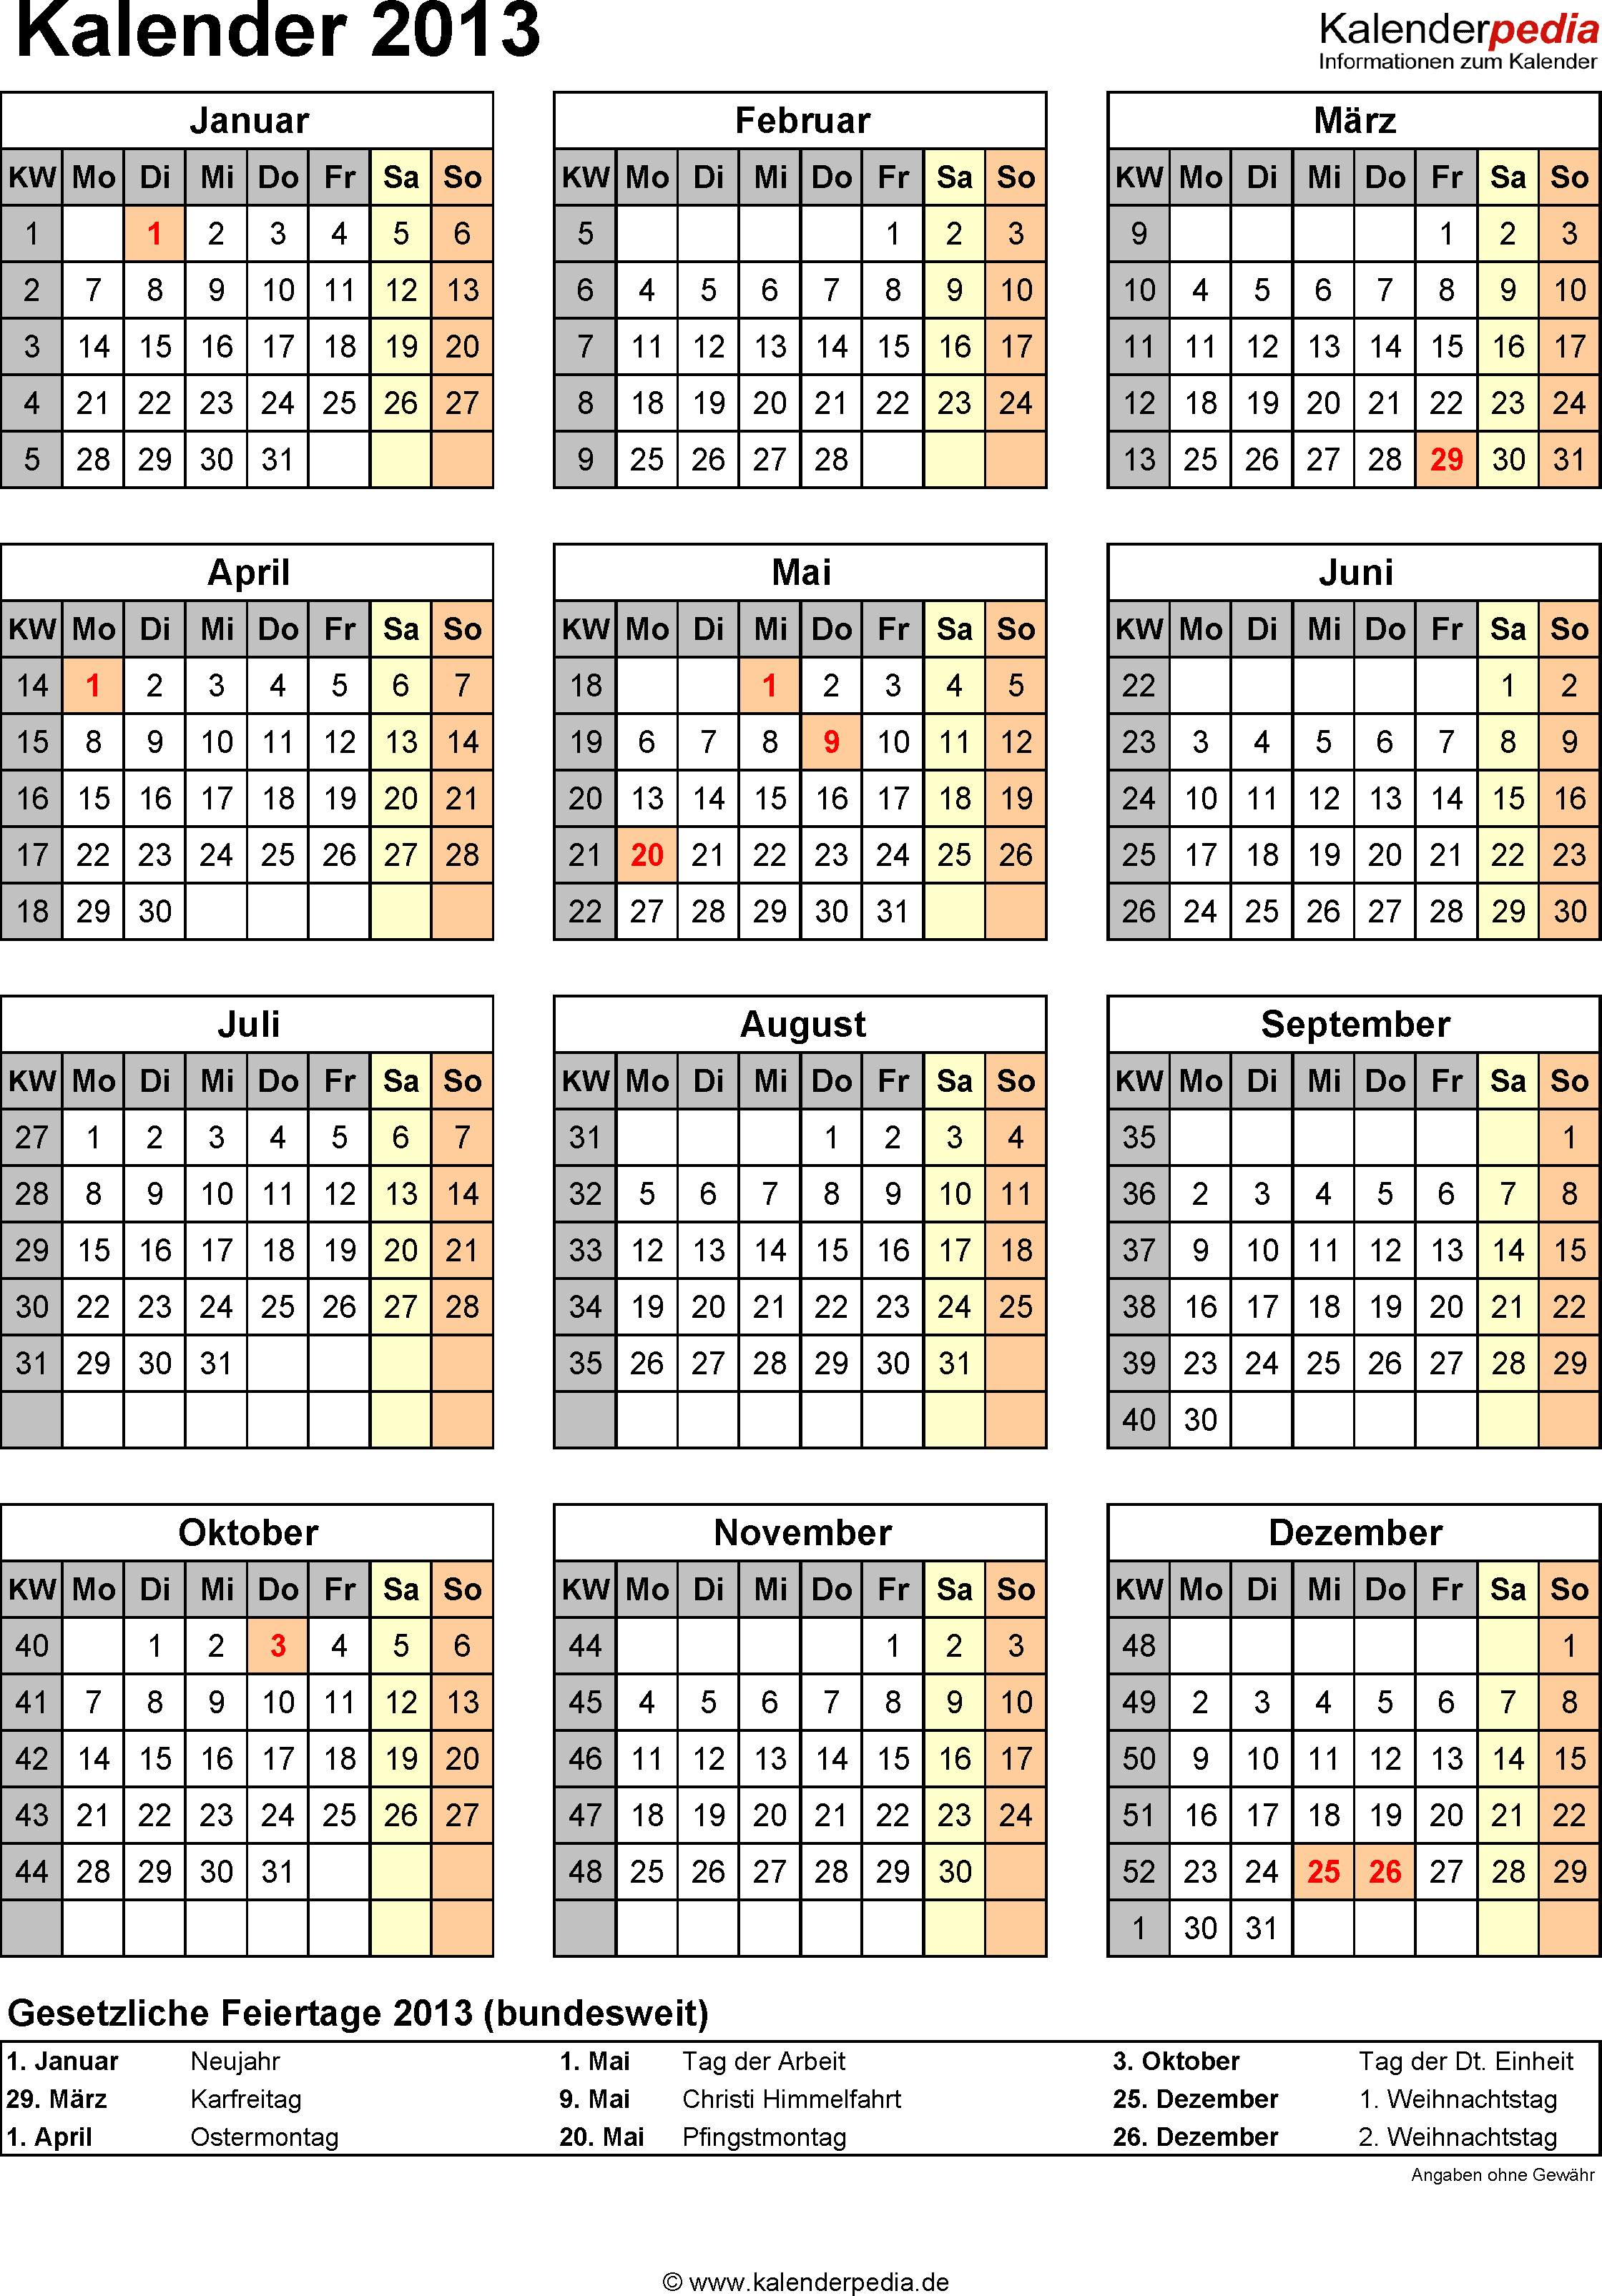 Kalender 2013 im Hochformat